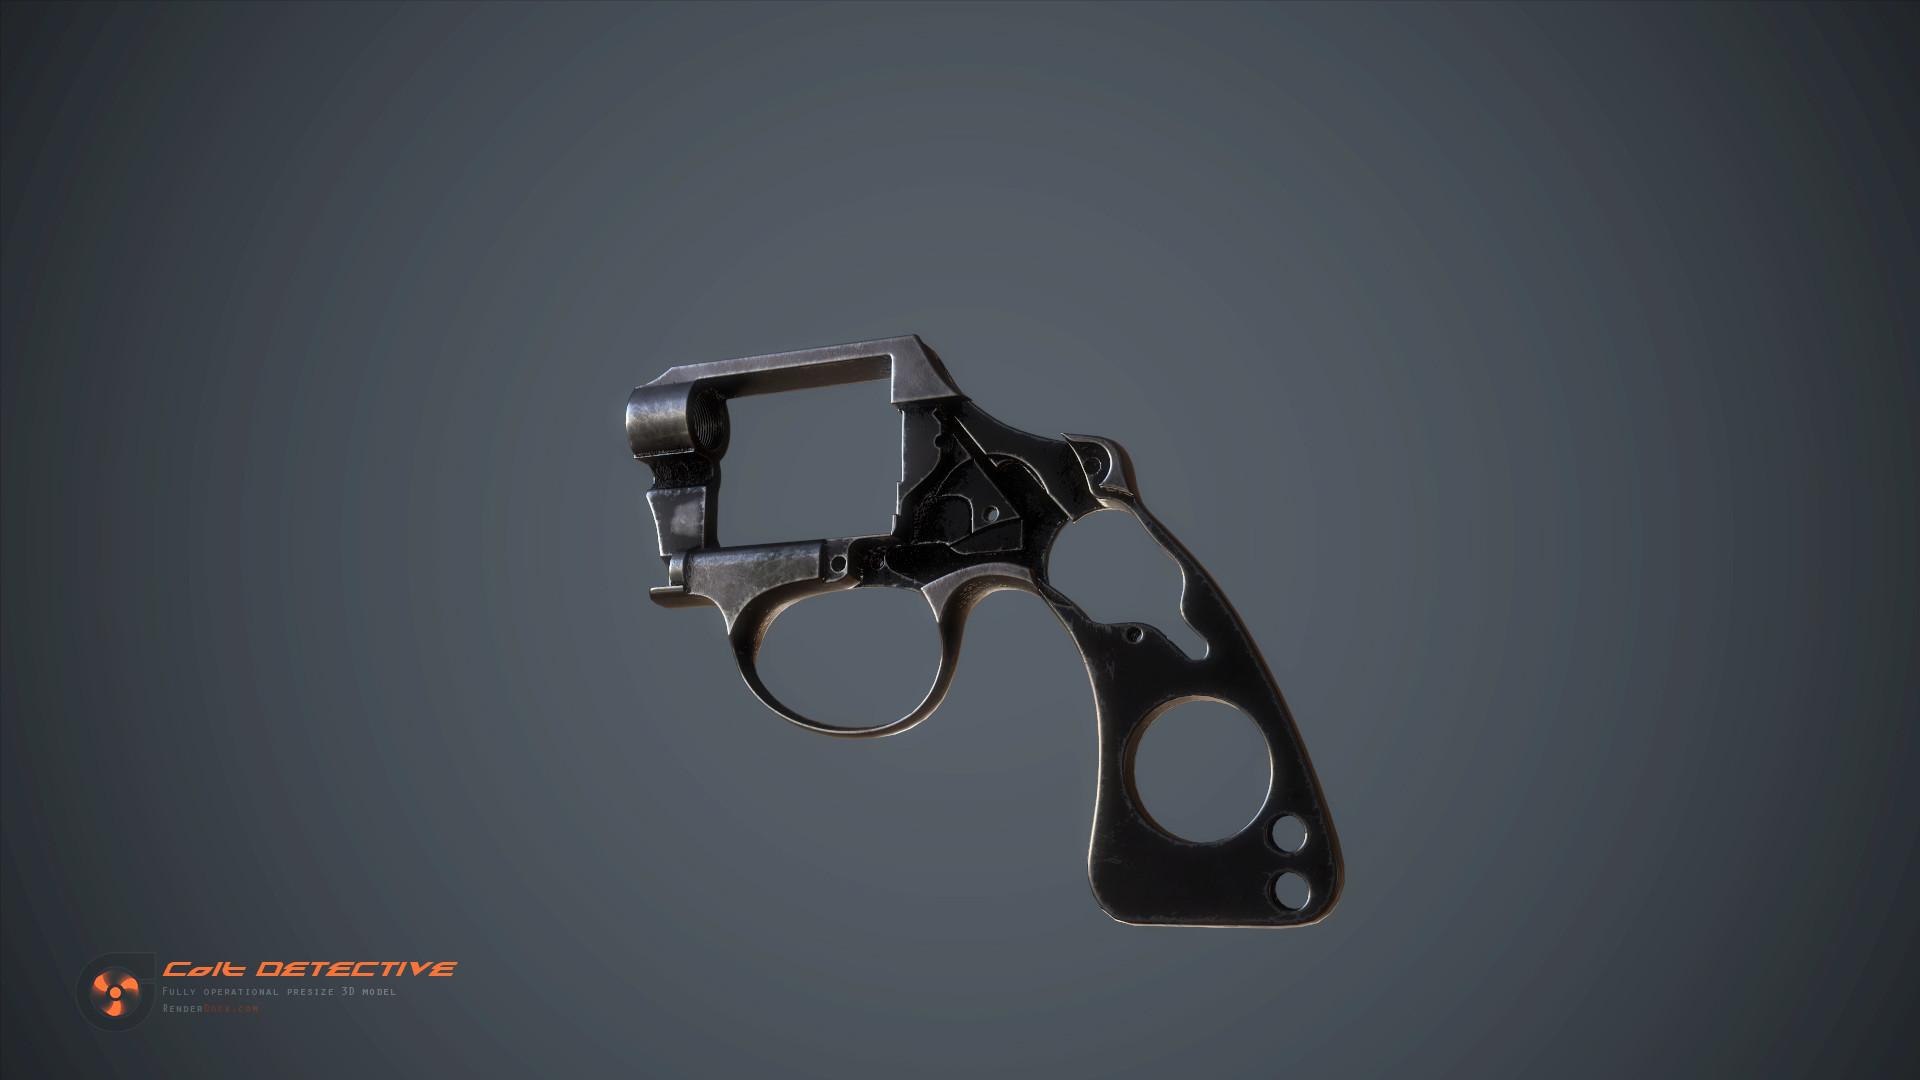 Renderdock studio colt detective detail06